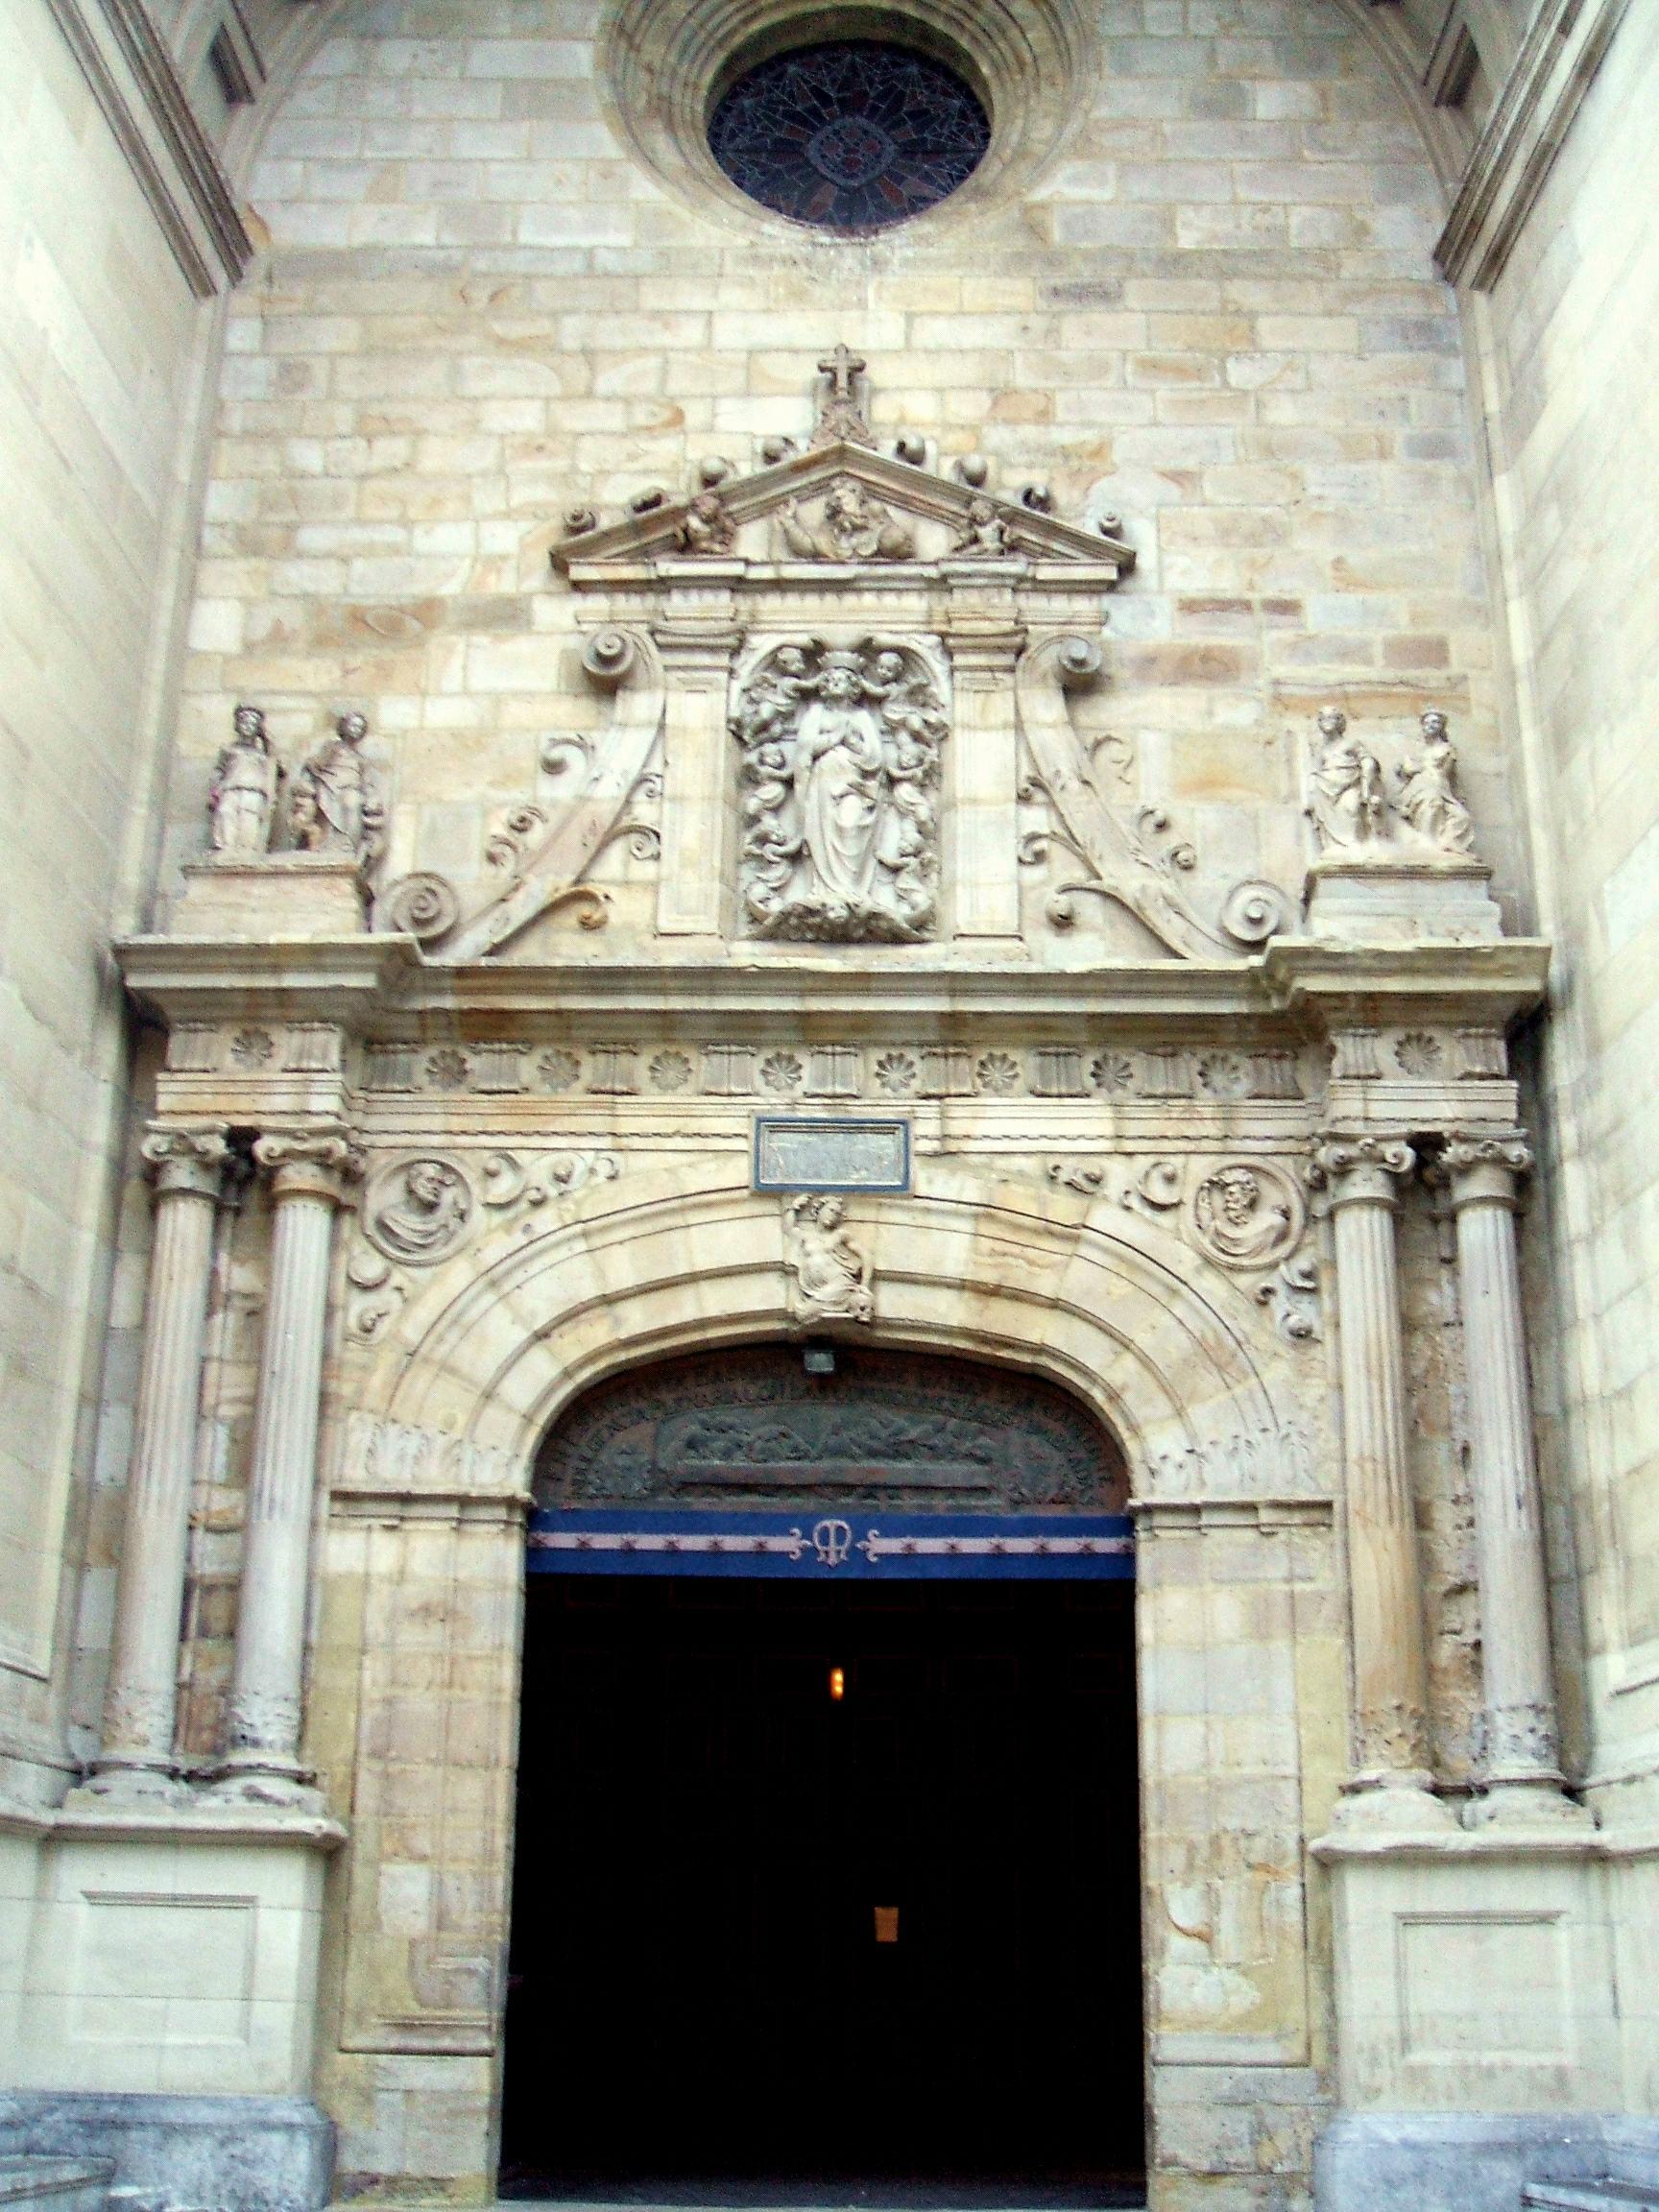 File:Bilbao - Basilica de Begoña 02.JPG - Wikimedia Commons